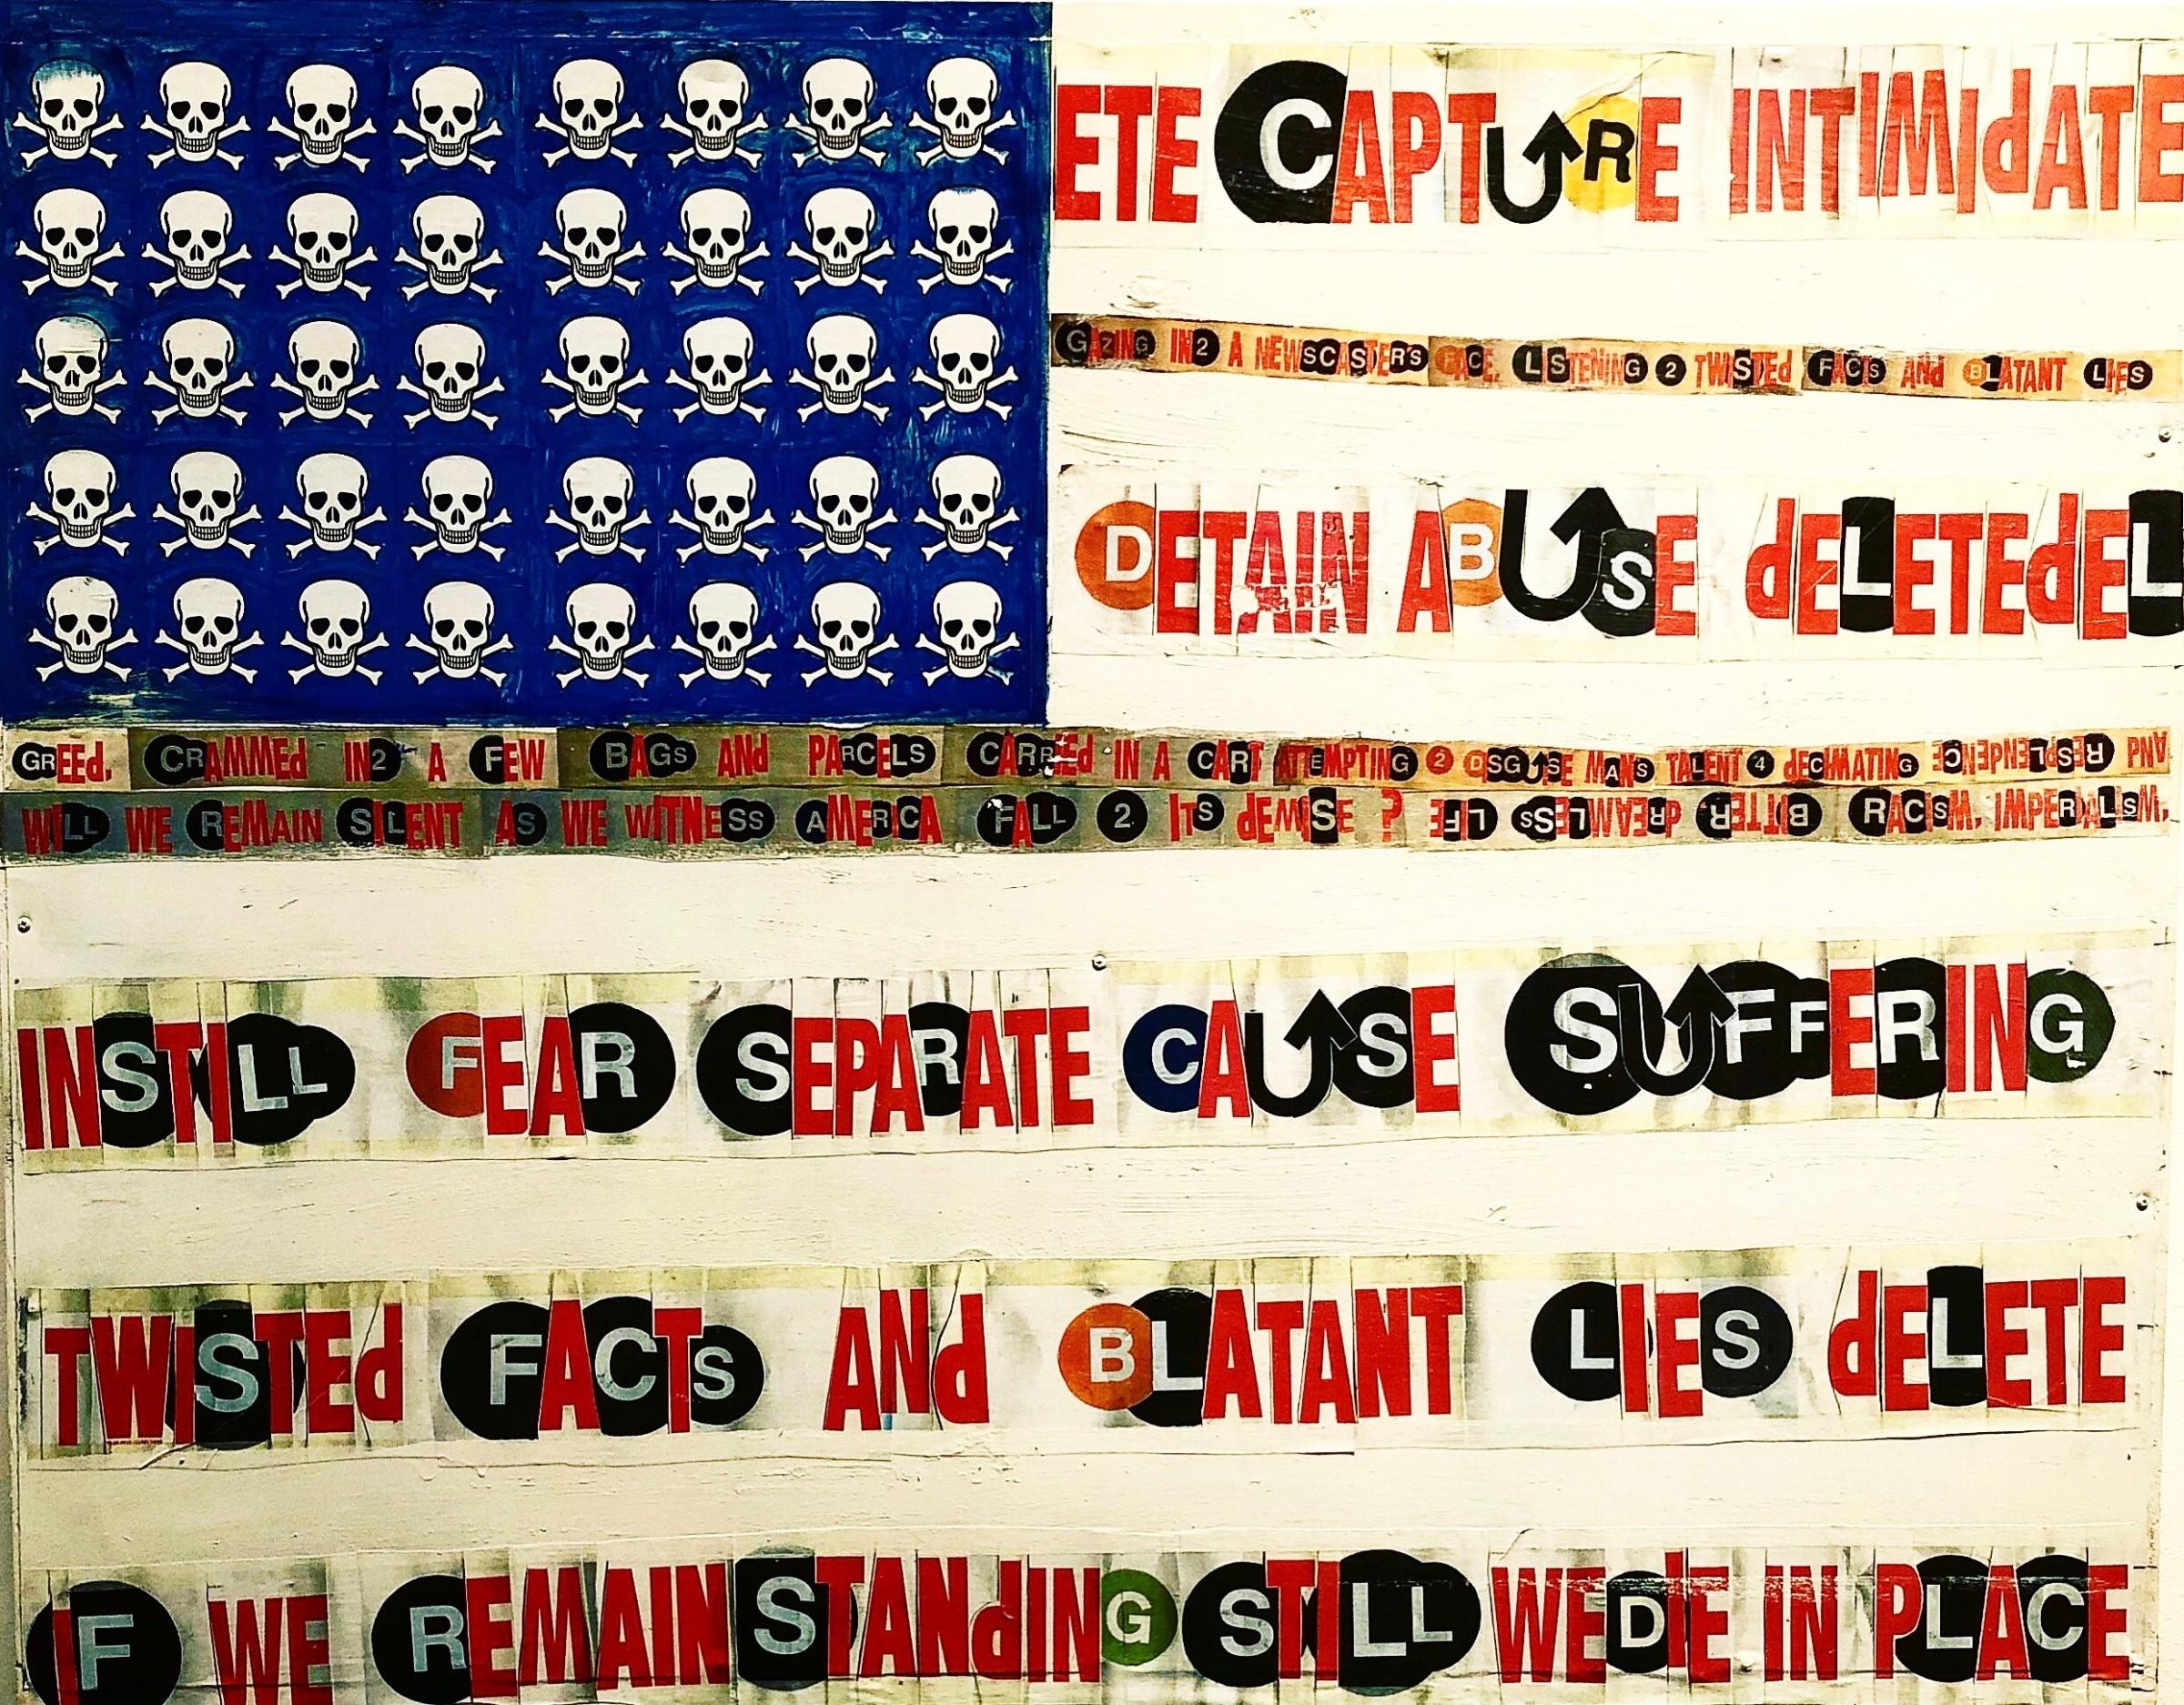 <span class=&#34;link fancybox-details-link&#34;><a href=&#34;/artworks/185-al-diaz-flag-2018/&#34;>View Detail Page</a></span><div class=&#34;artist&#34;><strong>Al Diaz</strong></div> <div class=&#34;title&#34;><em>Flag</em>, 2018</div> <div class=&#34;medium&#34;>Mixed Media on Sheet Metal</div> <div class=&#34;dimensions&#34;>36 x 48 in<br /> 91.4 x 121.9 cm</div>